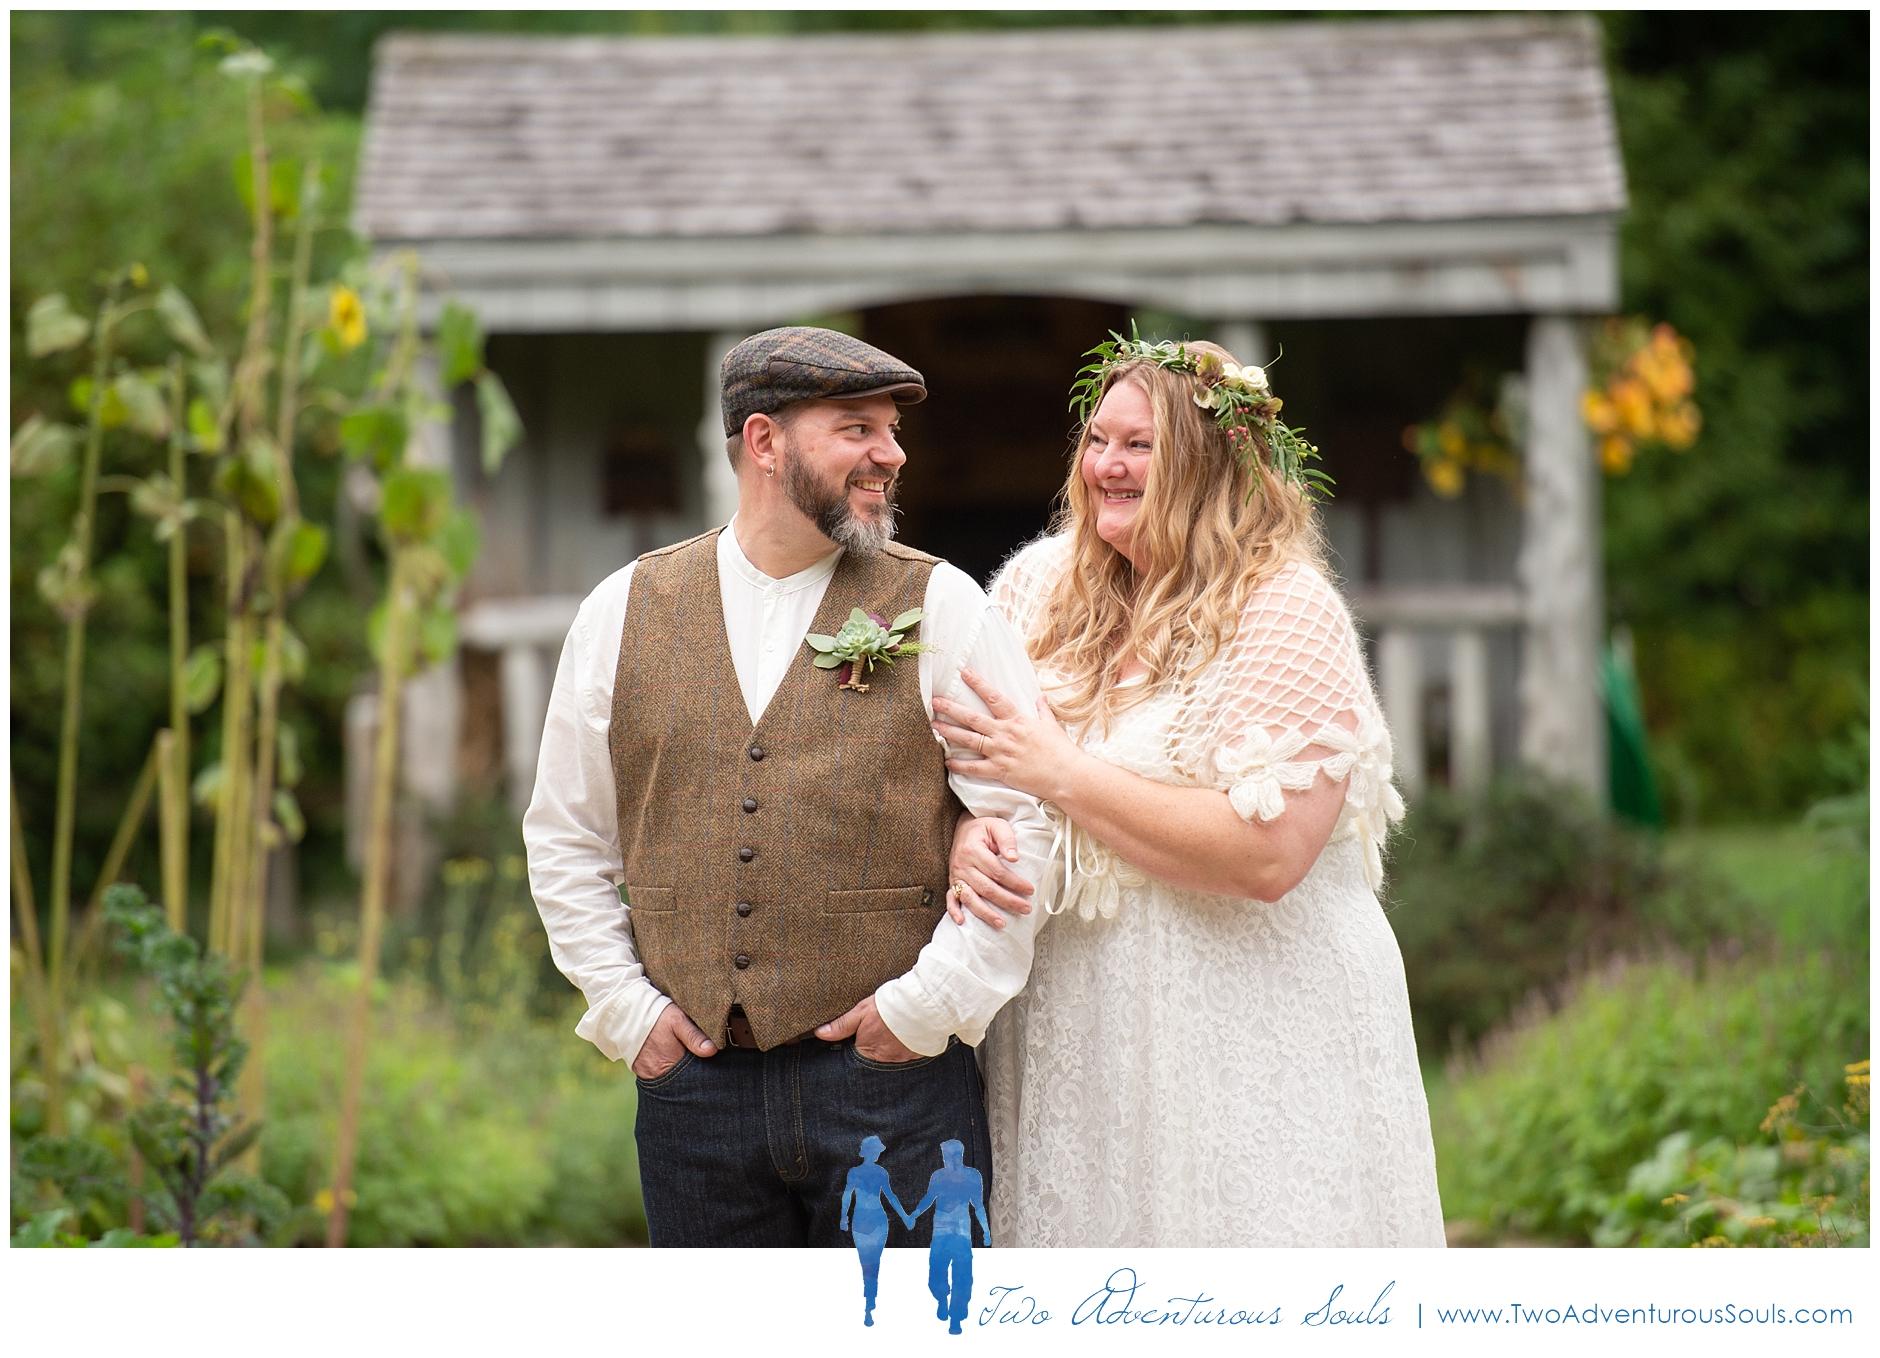 091218 - Chad & Kimmi - sneaks-26_Hidden Pond Wedding, Earth at Hidden Pond, Kennebunkport Wedding.jpg